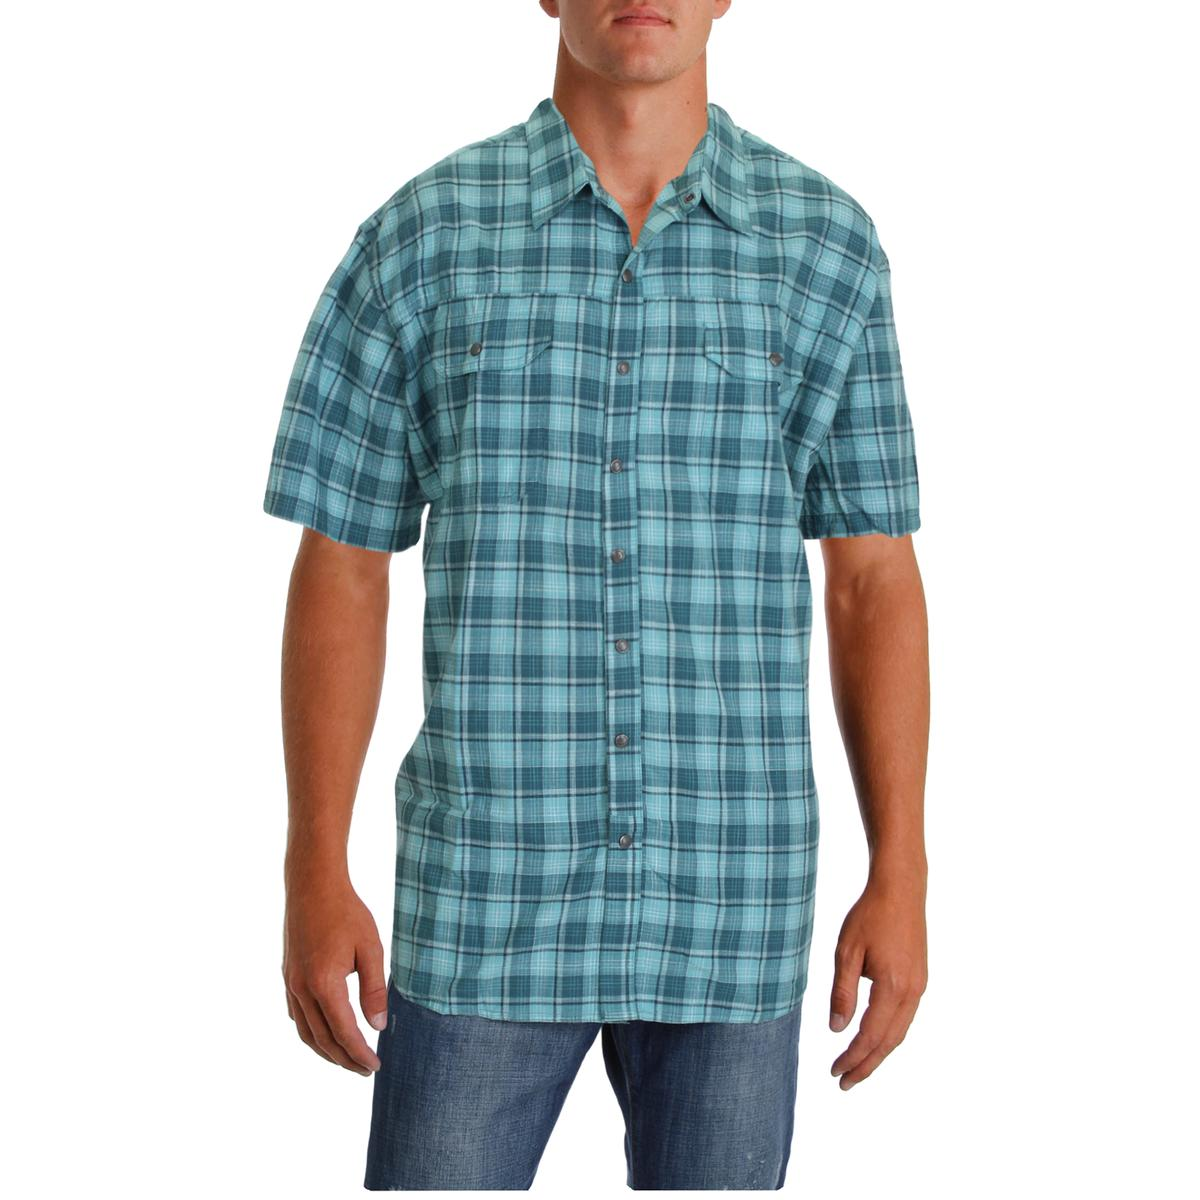 6d46eaf813b Details about Columbia Mens Leadville Ridge Plaid Button-Down Shirt Top Big  & Tall BHFO 7411